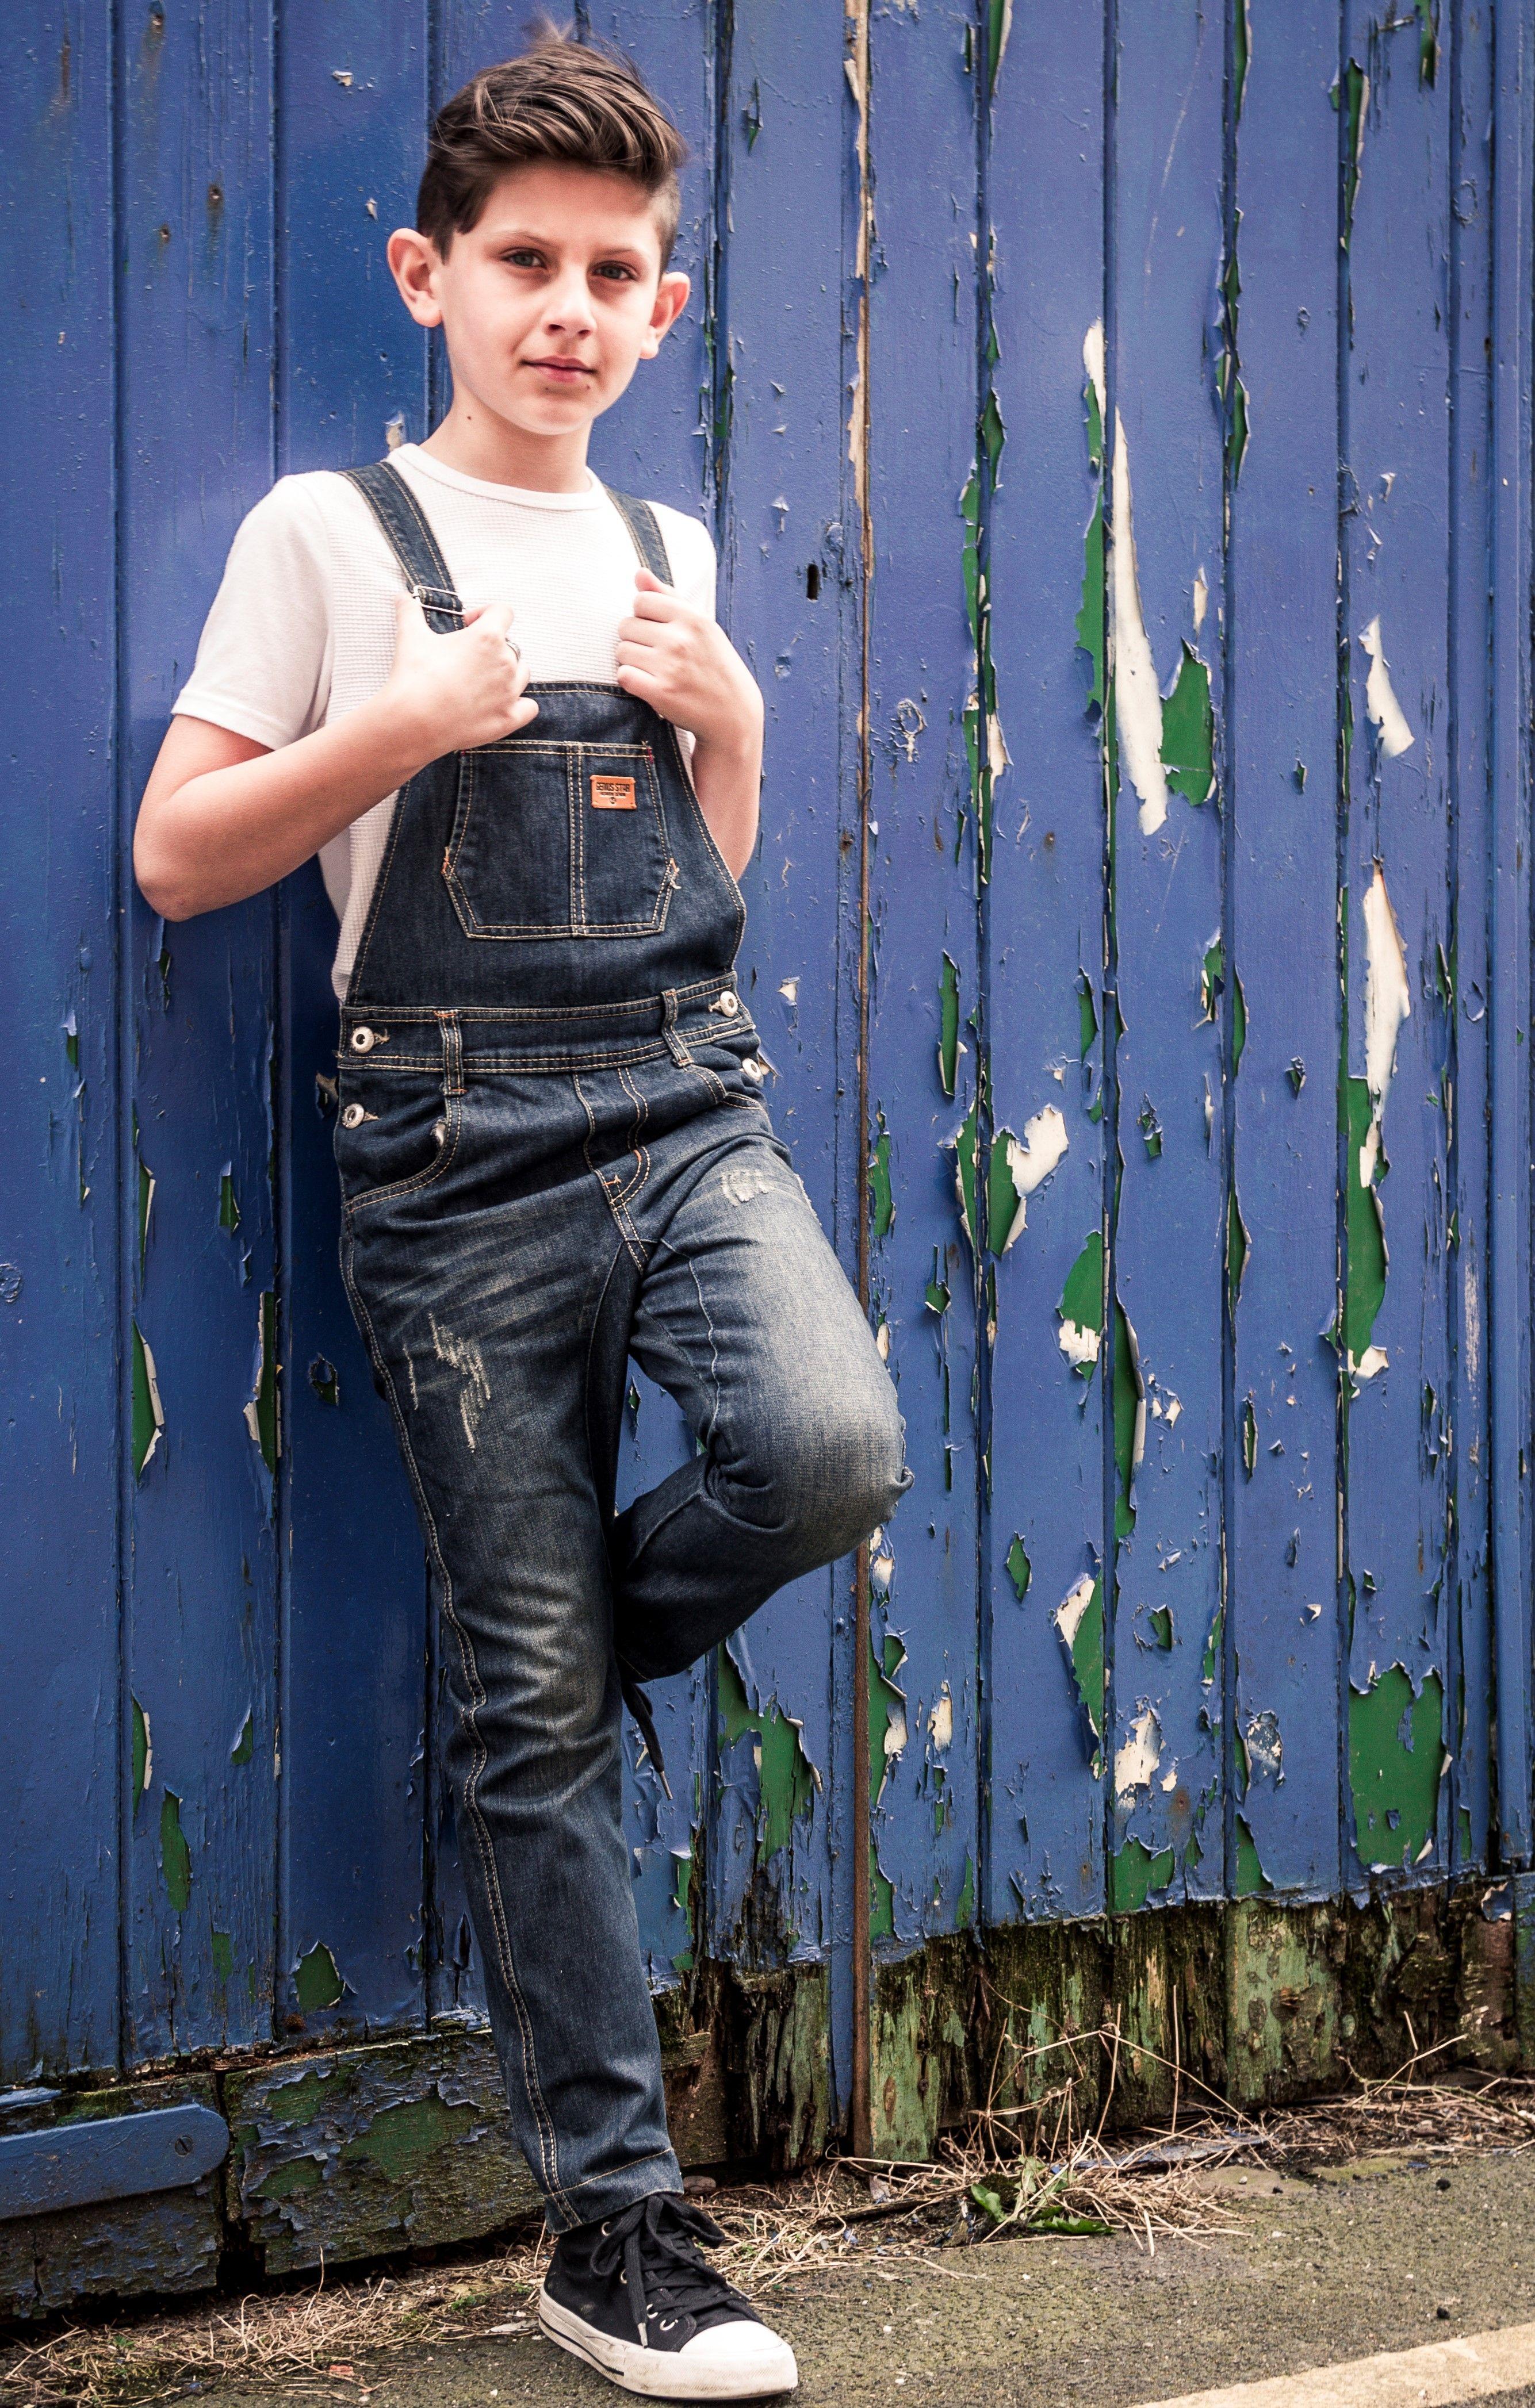 Boys Denim Bib-overalls. #dungarees #kidsfashion | Dungarees, Kids  dungarees, Overalls